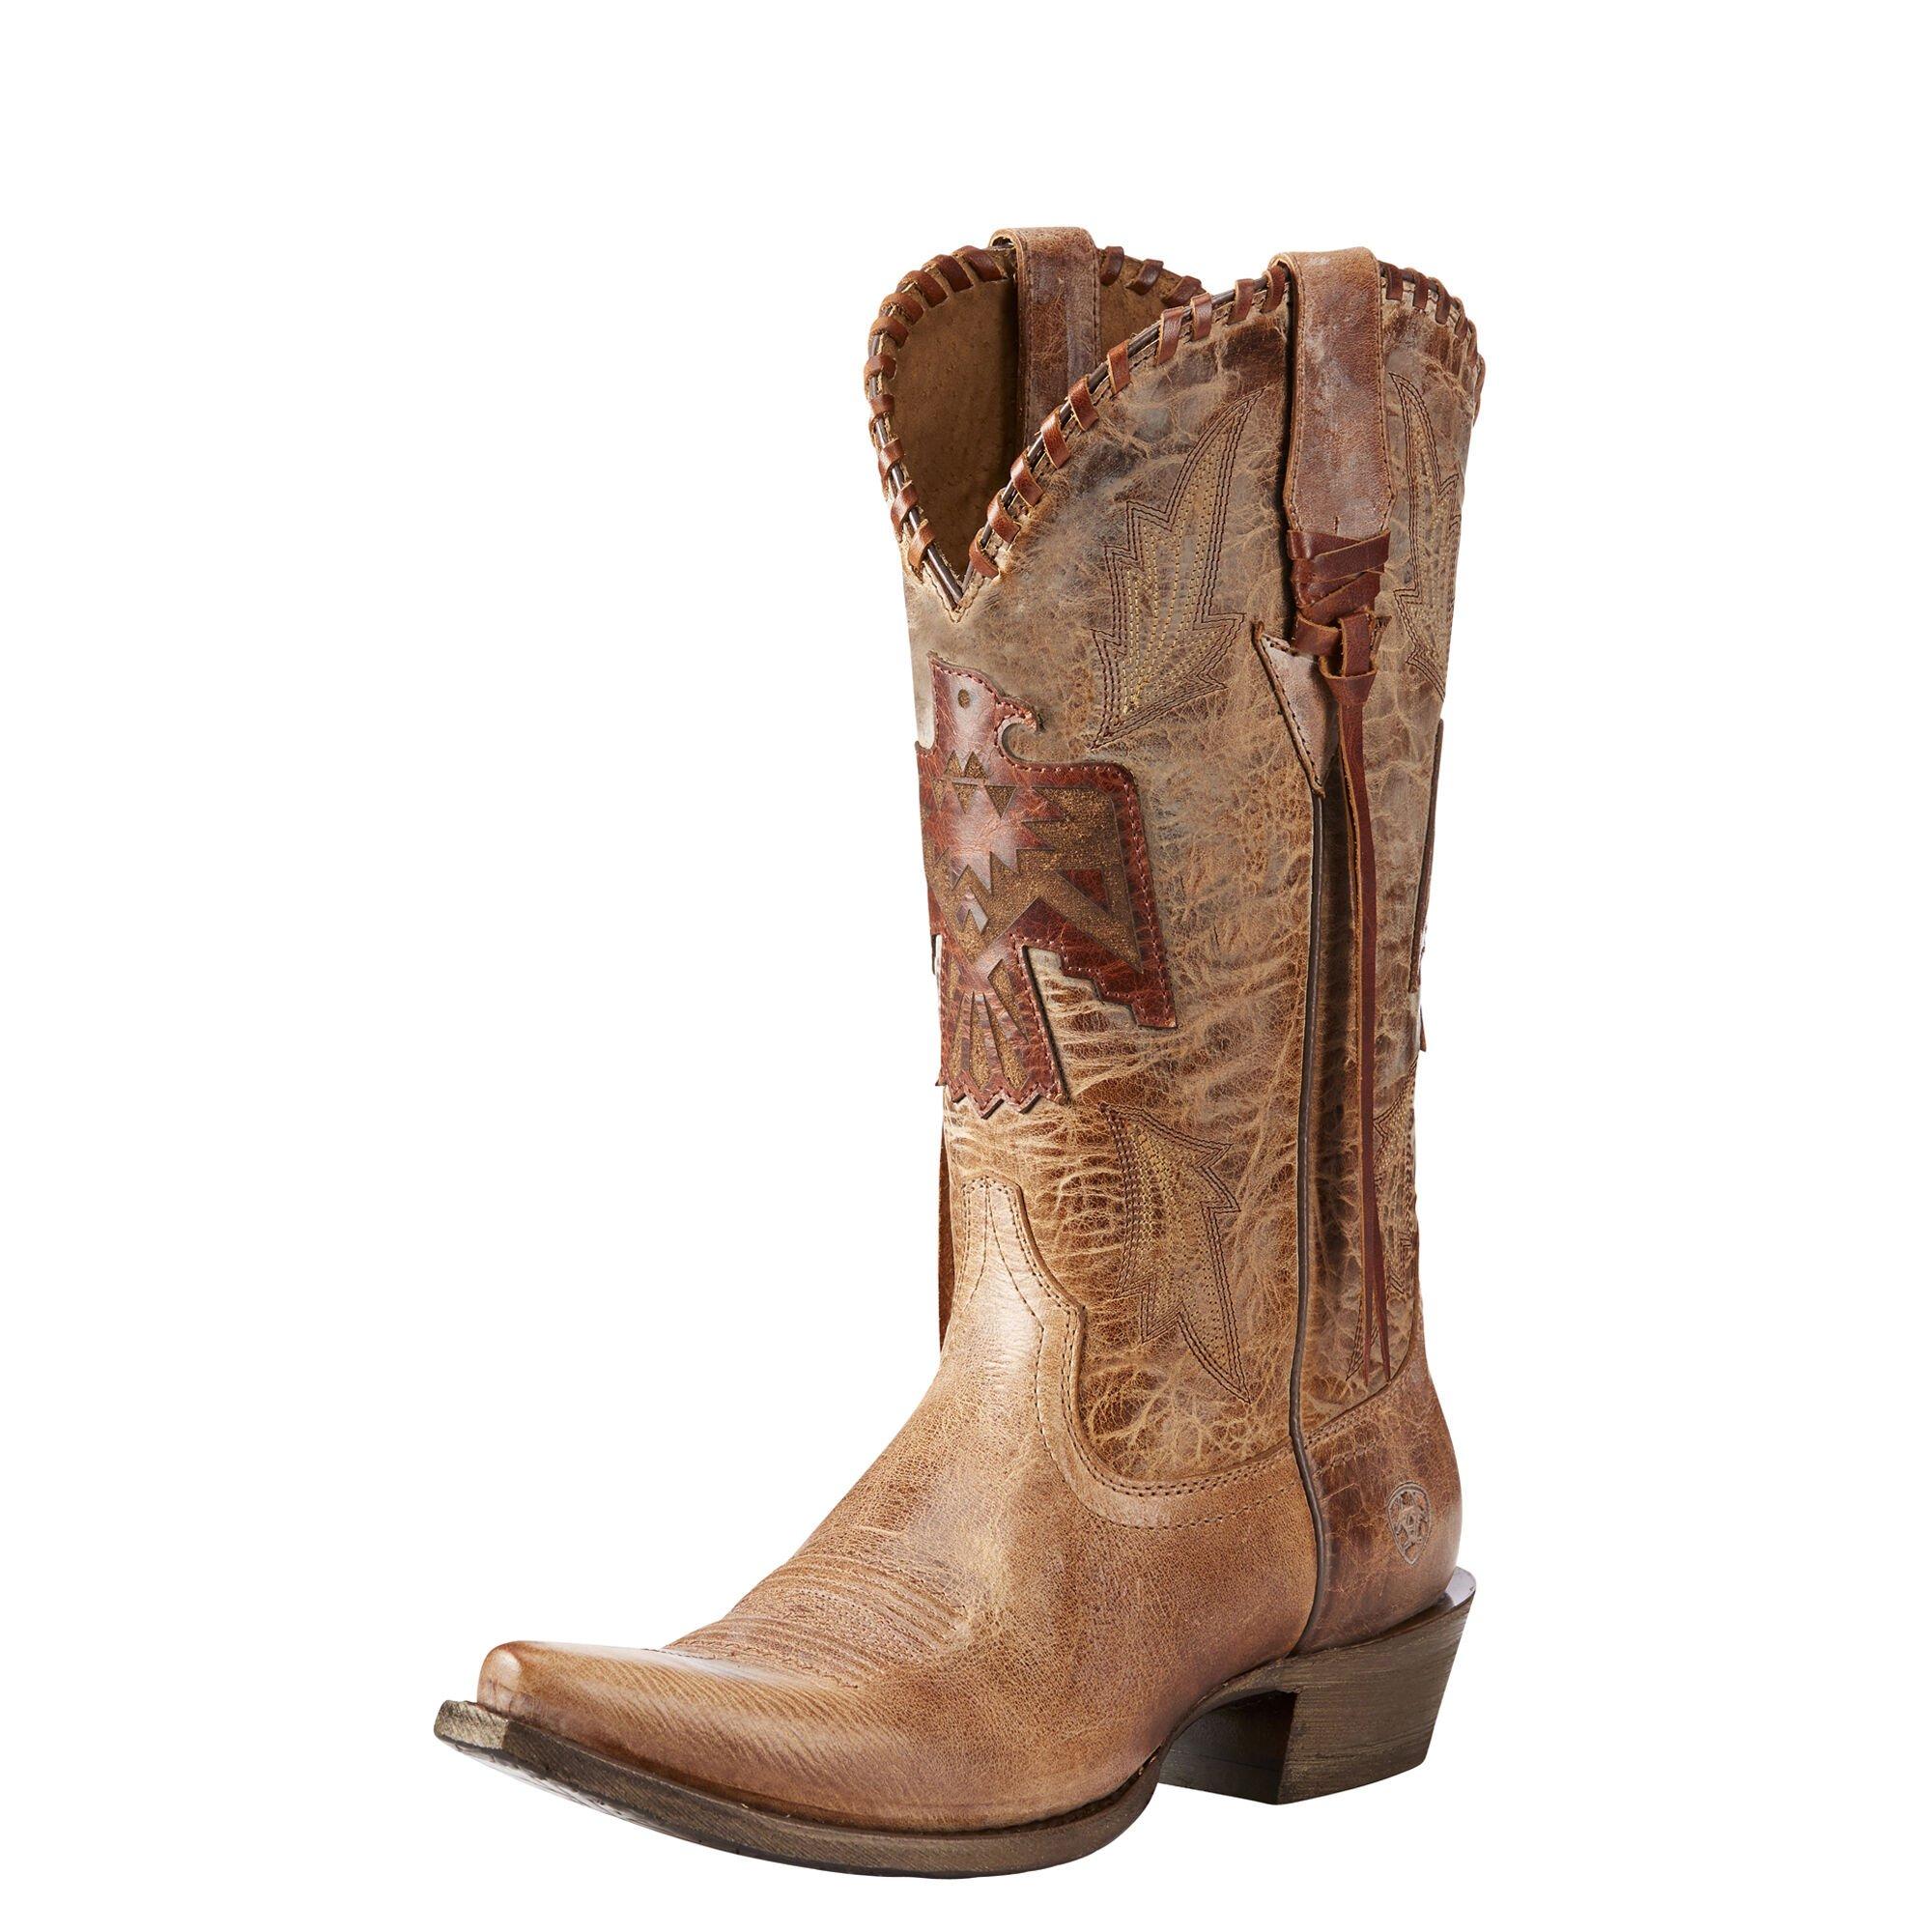 Thunderbird X Toe Western Boot